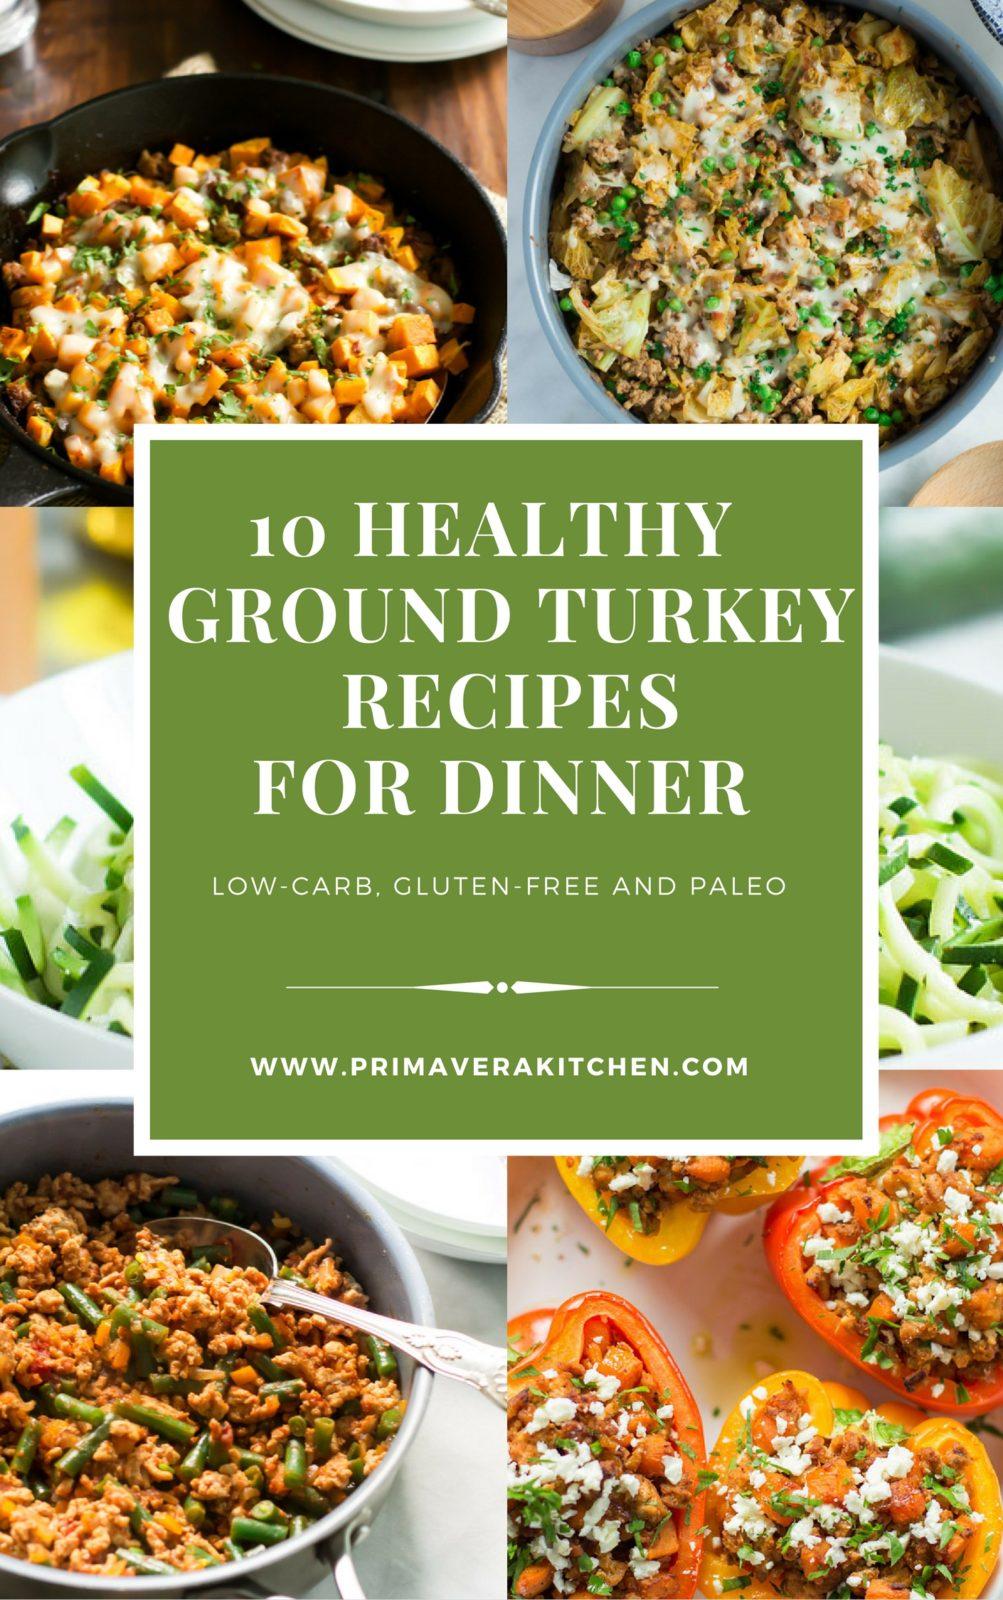 recipe: low carb dinner recipes ground turkey [1]